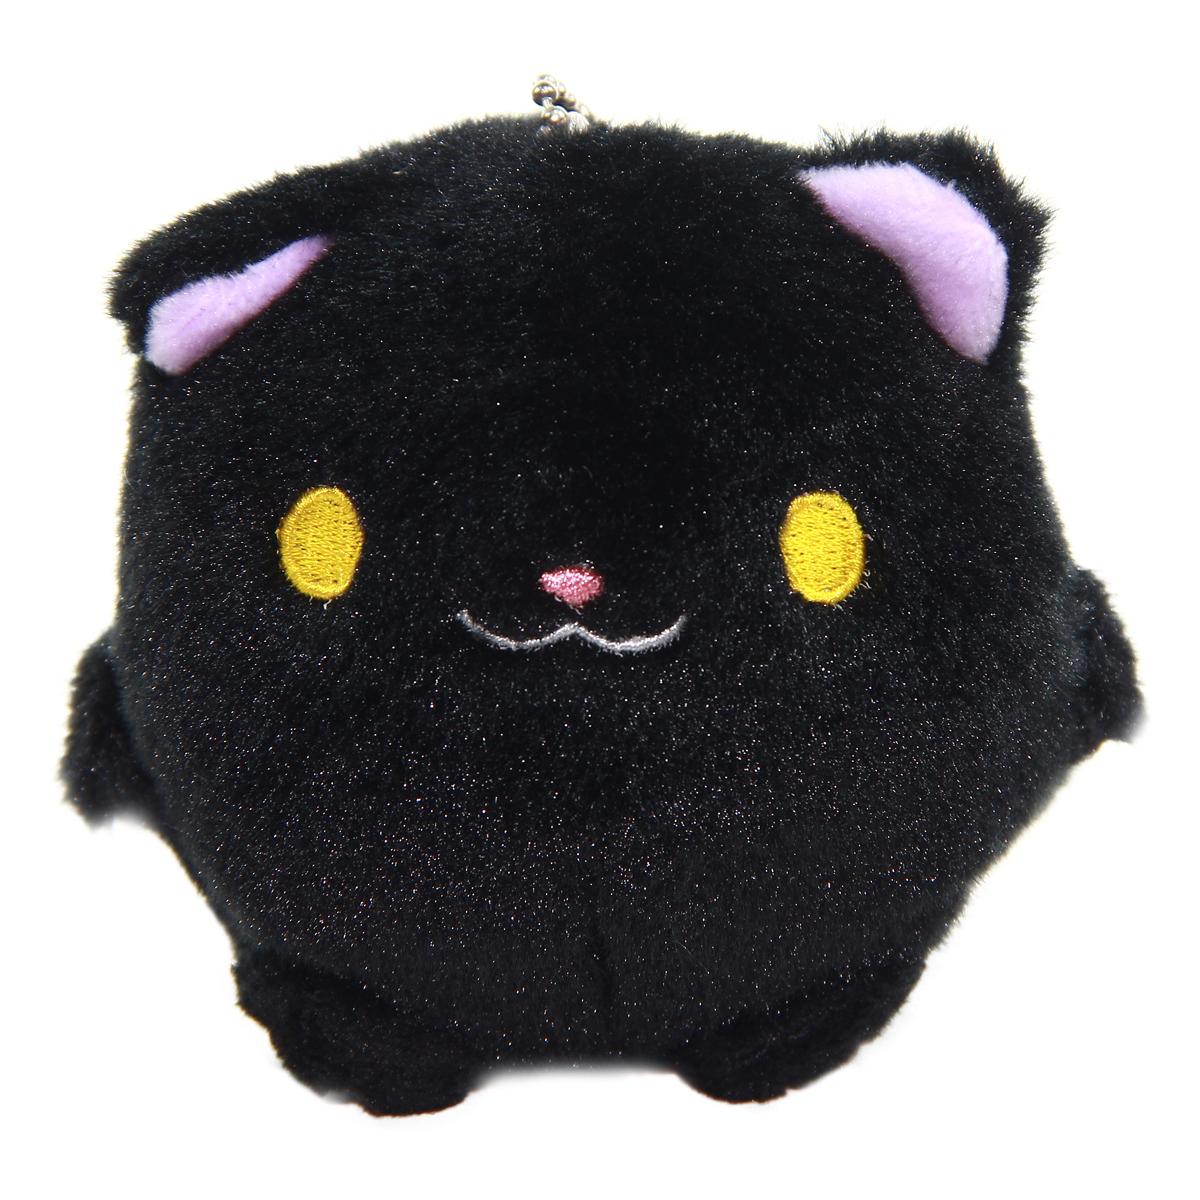 Kitten Plush Doll Kawaii Stuffed Animal Soft Fuzzy Squishy Plushie Mochi Black